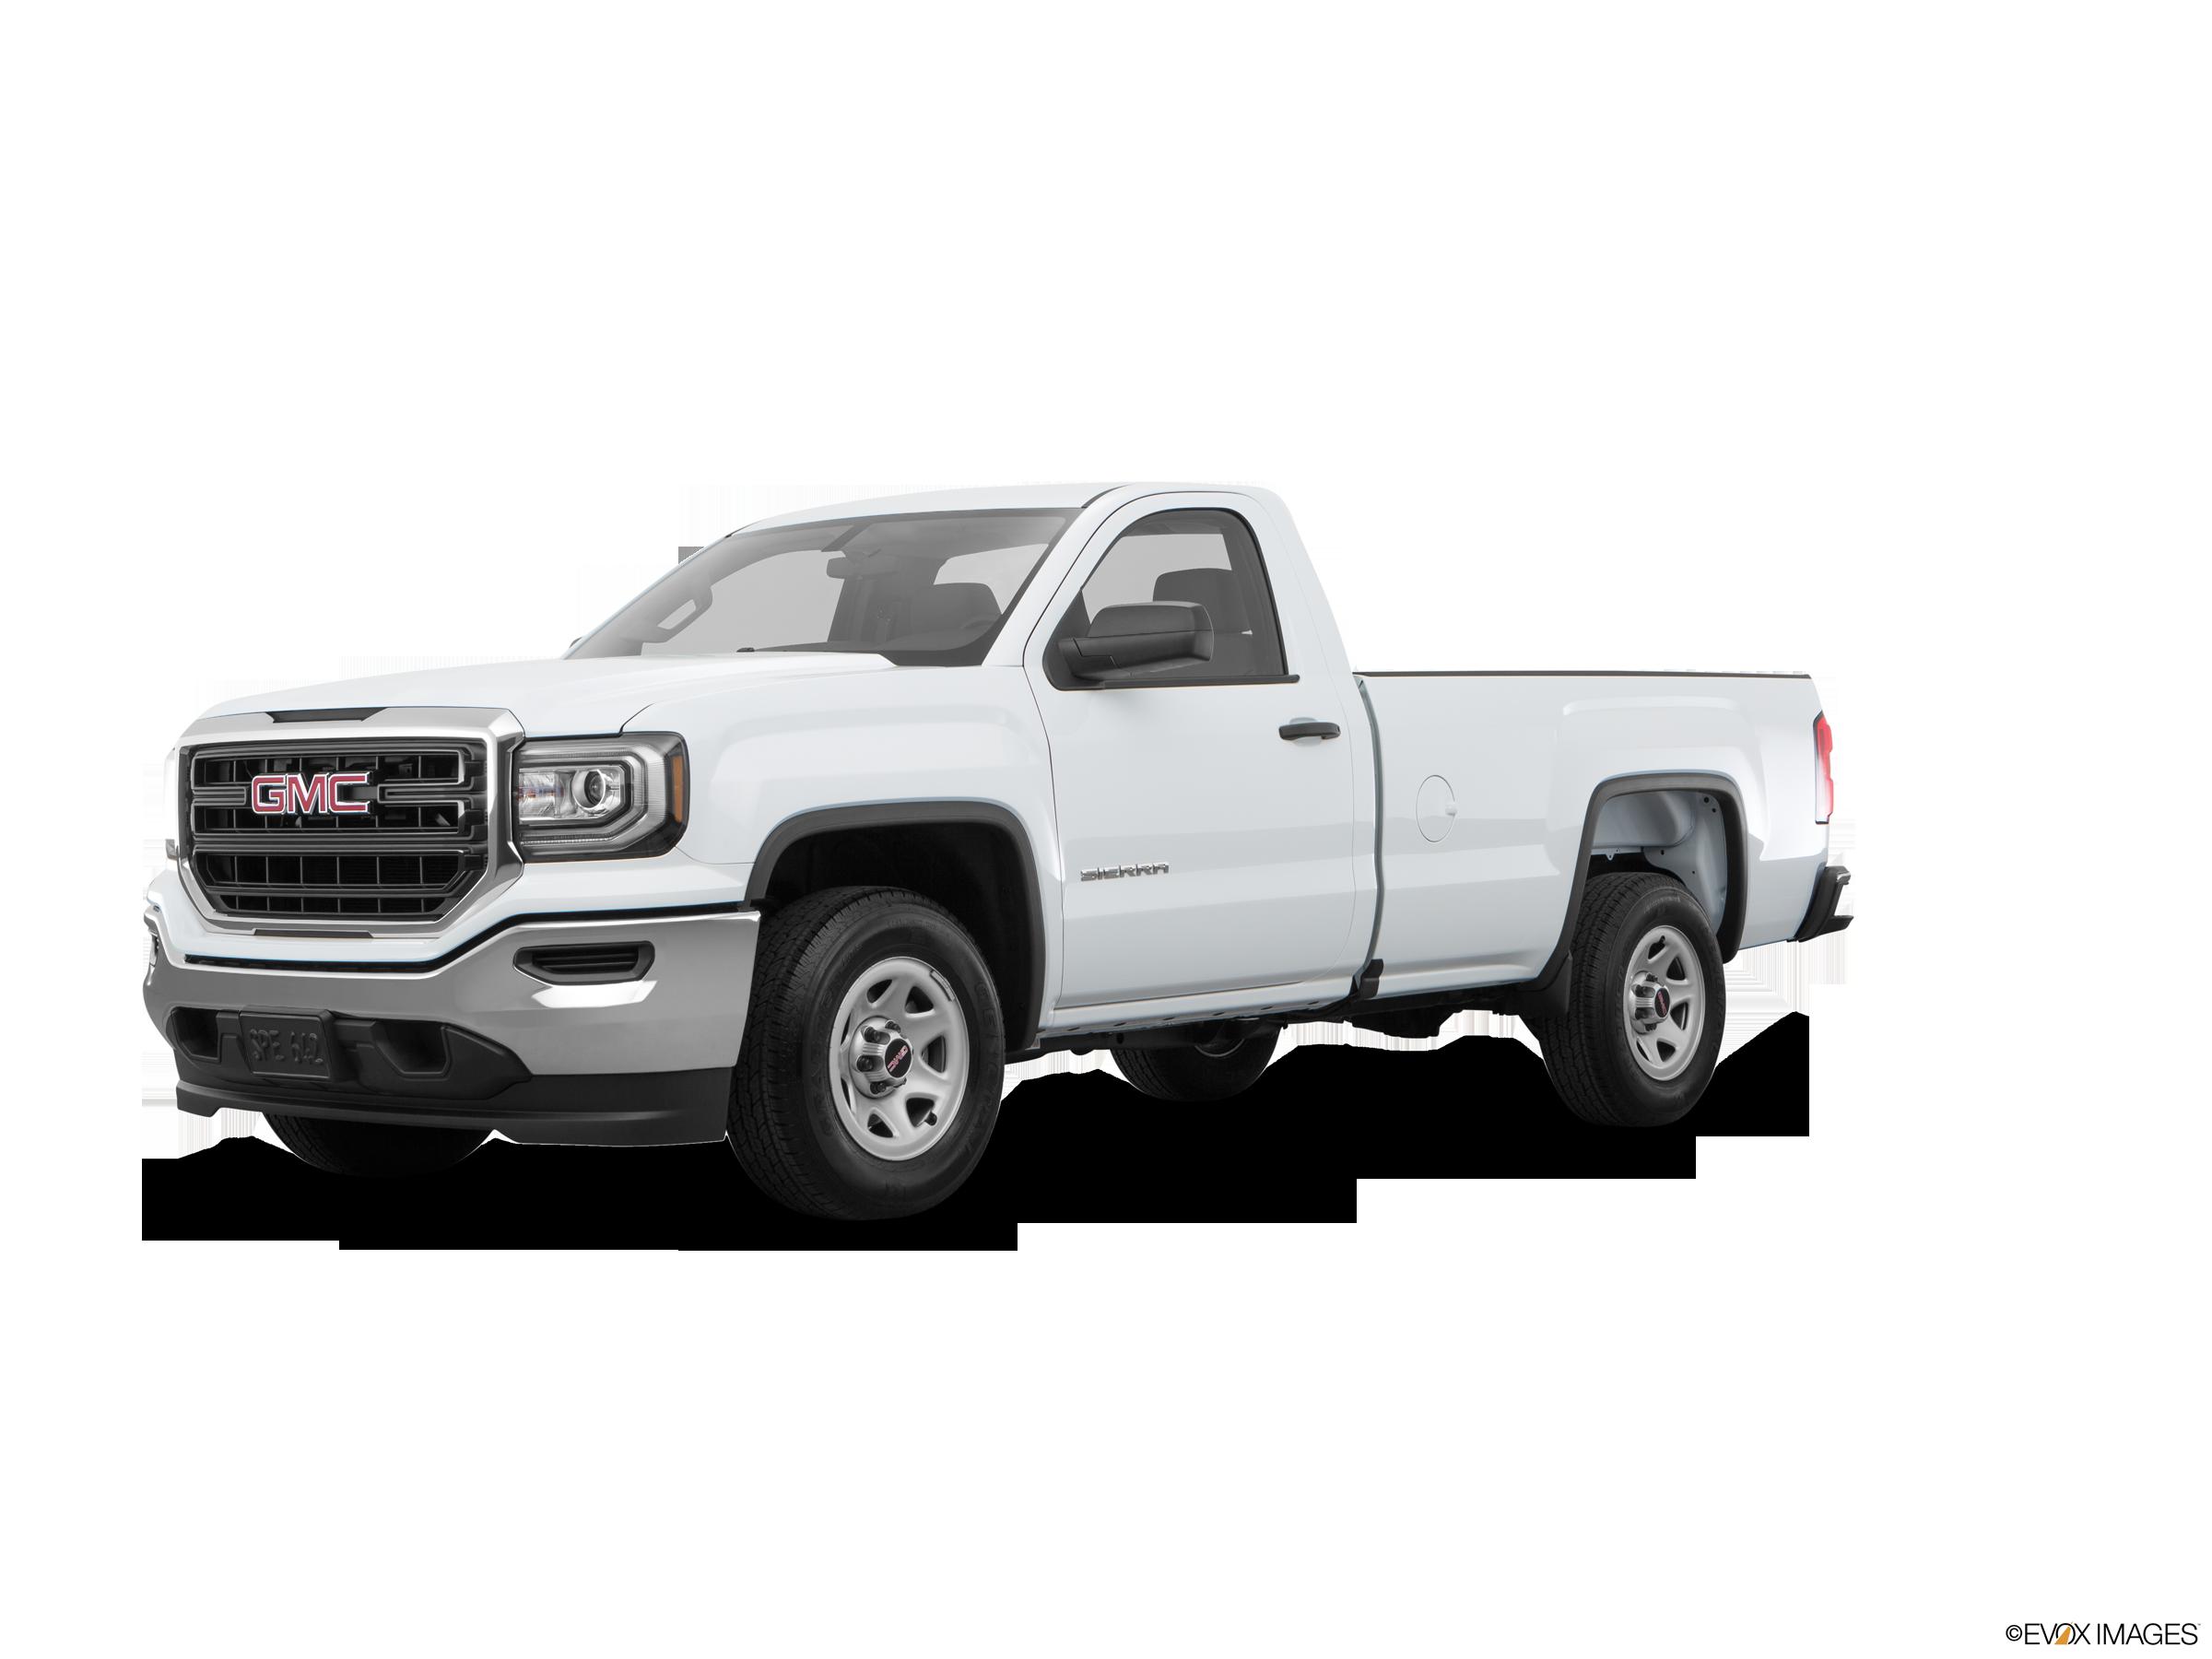 2016 Gmc Sierra 1500 Values Cars For Sale Kelley Blue Book